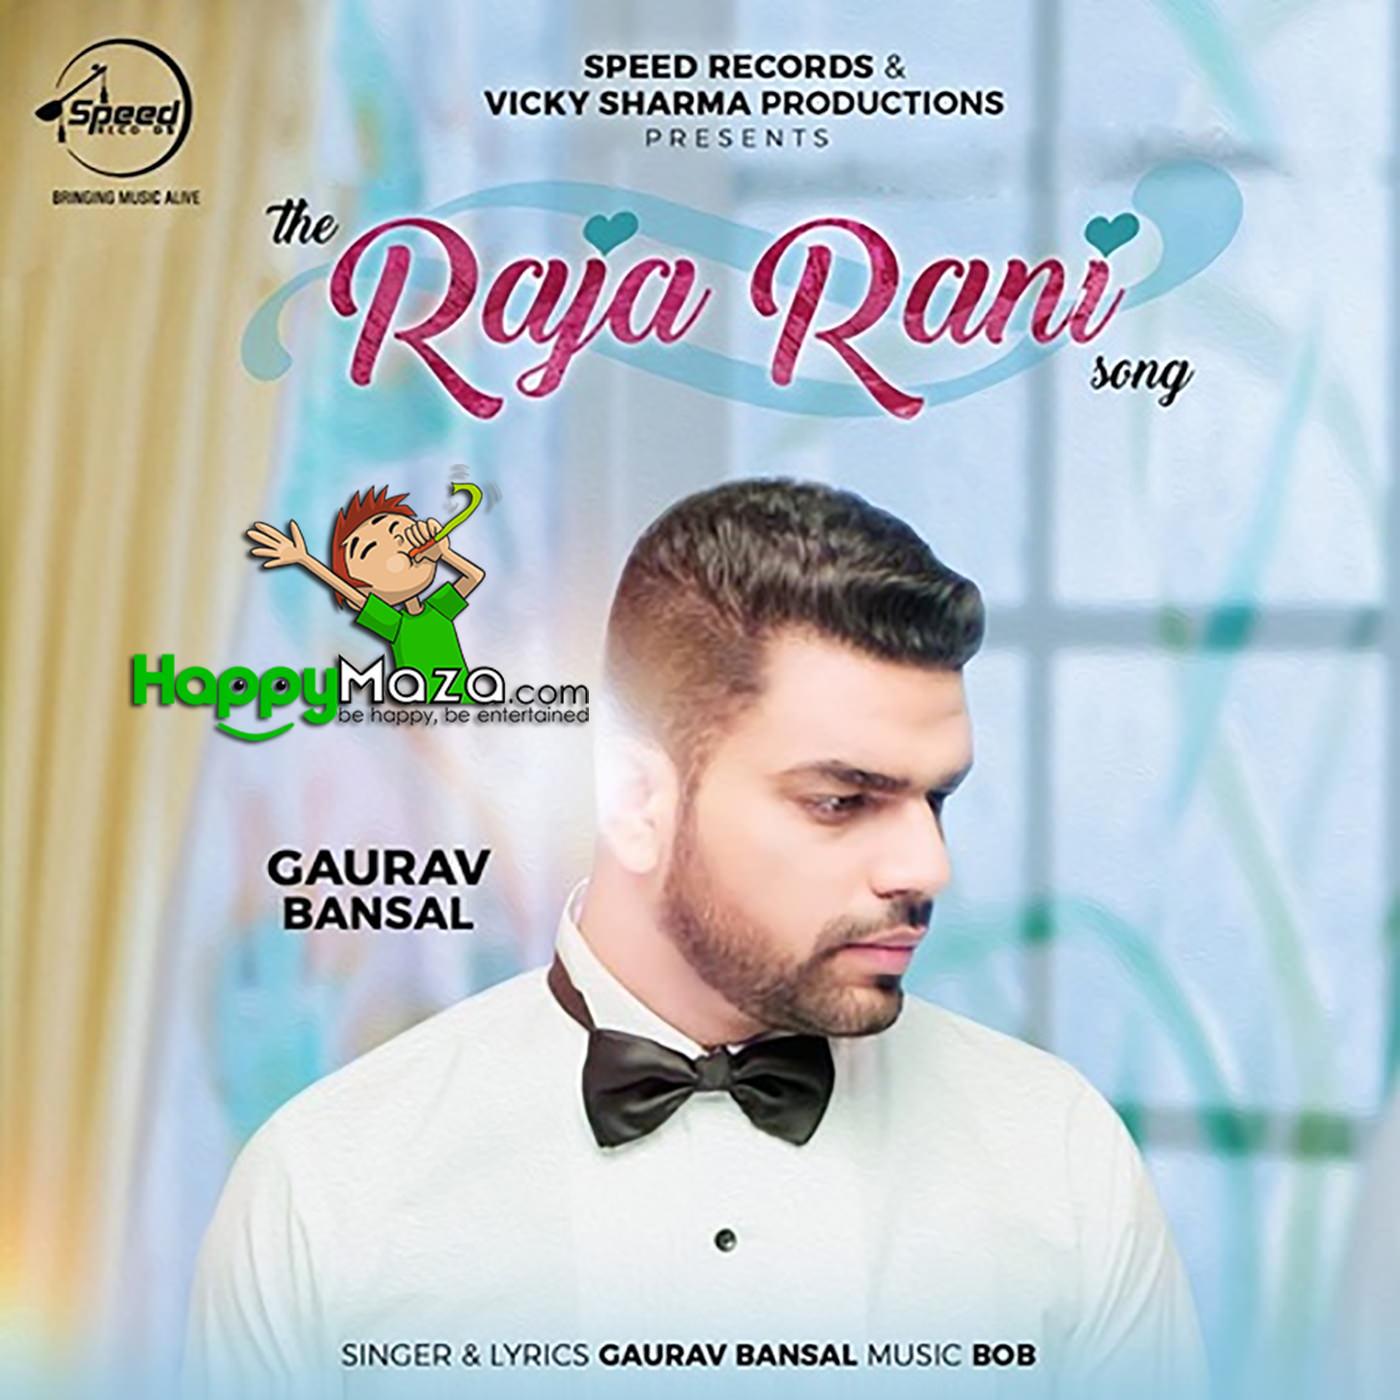 Manu Tu Lajabadshia Mp3 Song: Raja Rani Lyrics - Gaurav Bansal - 2017